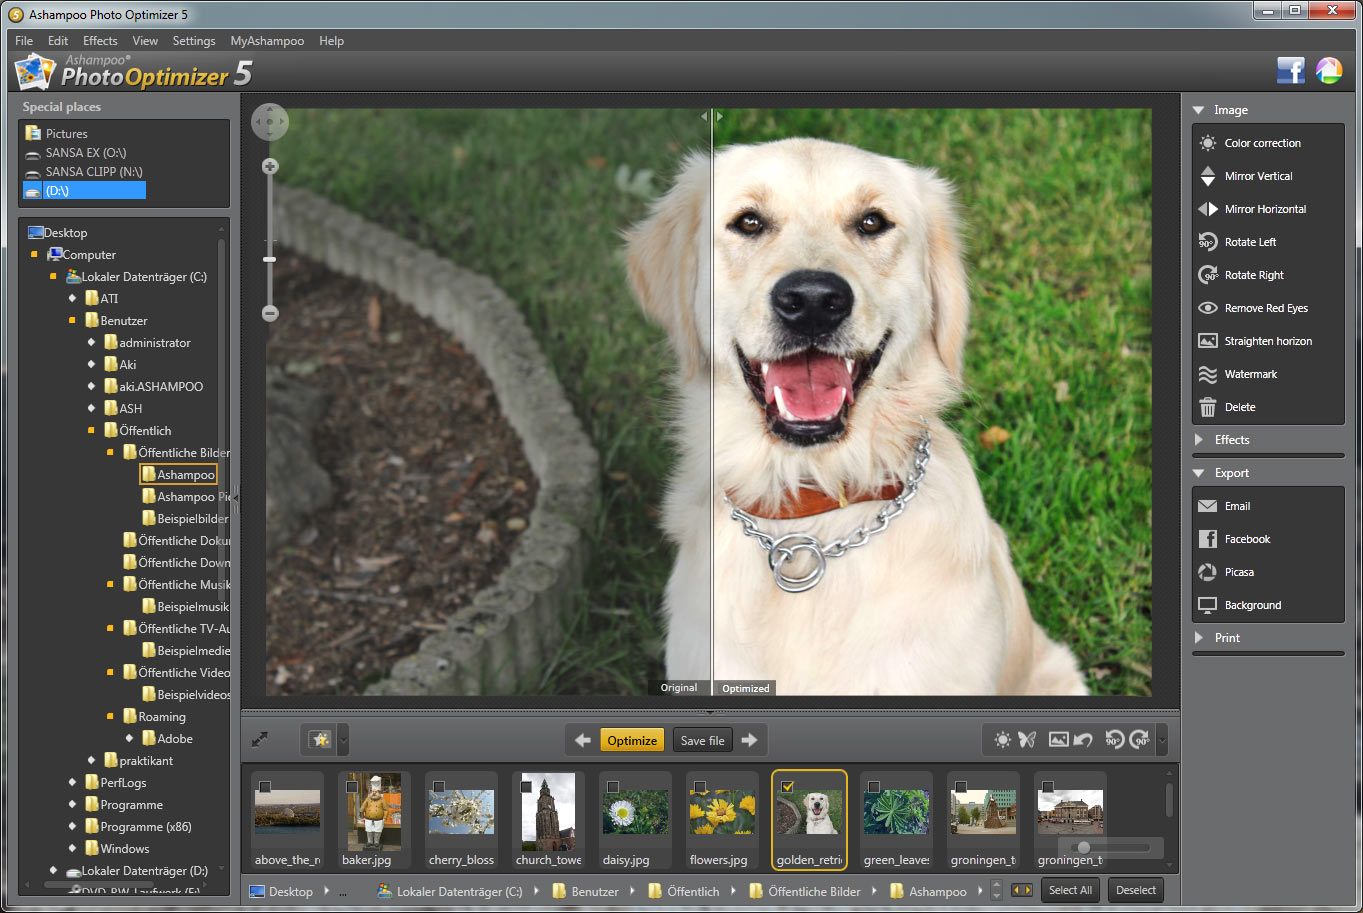 Ashampoo Photo Optimizer 5 – 图片优化软件丨反斗限免